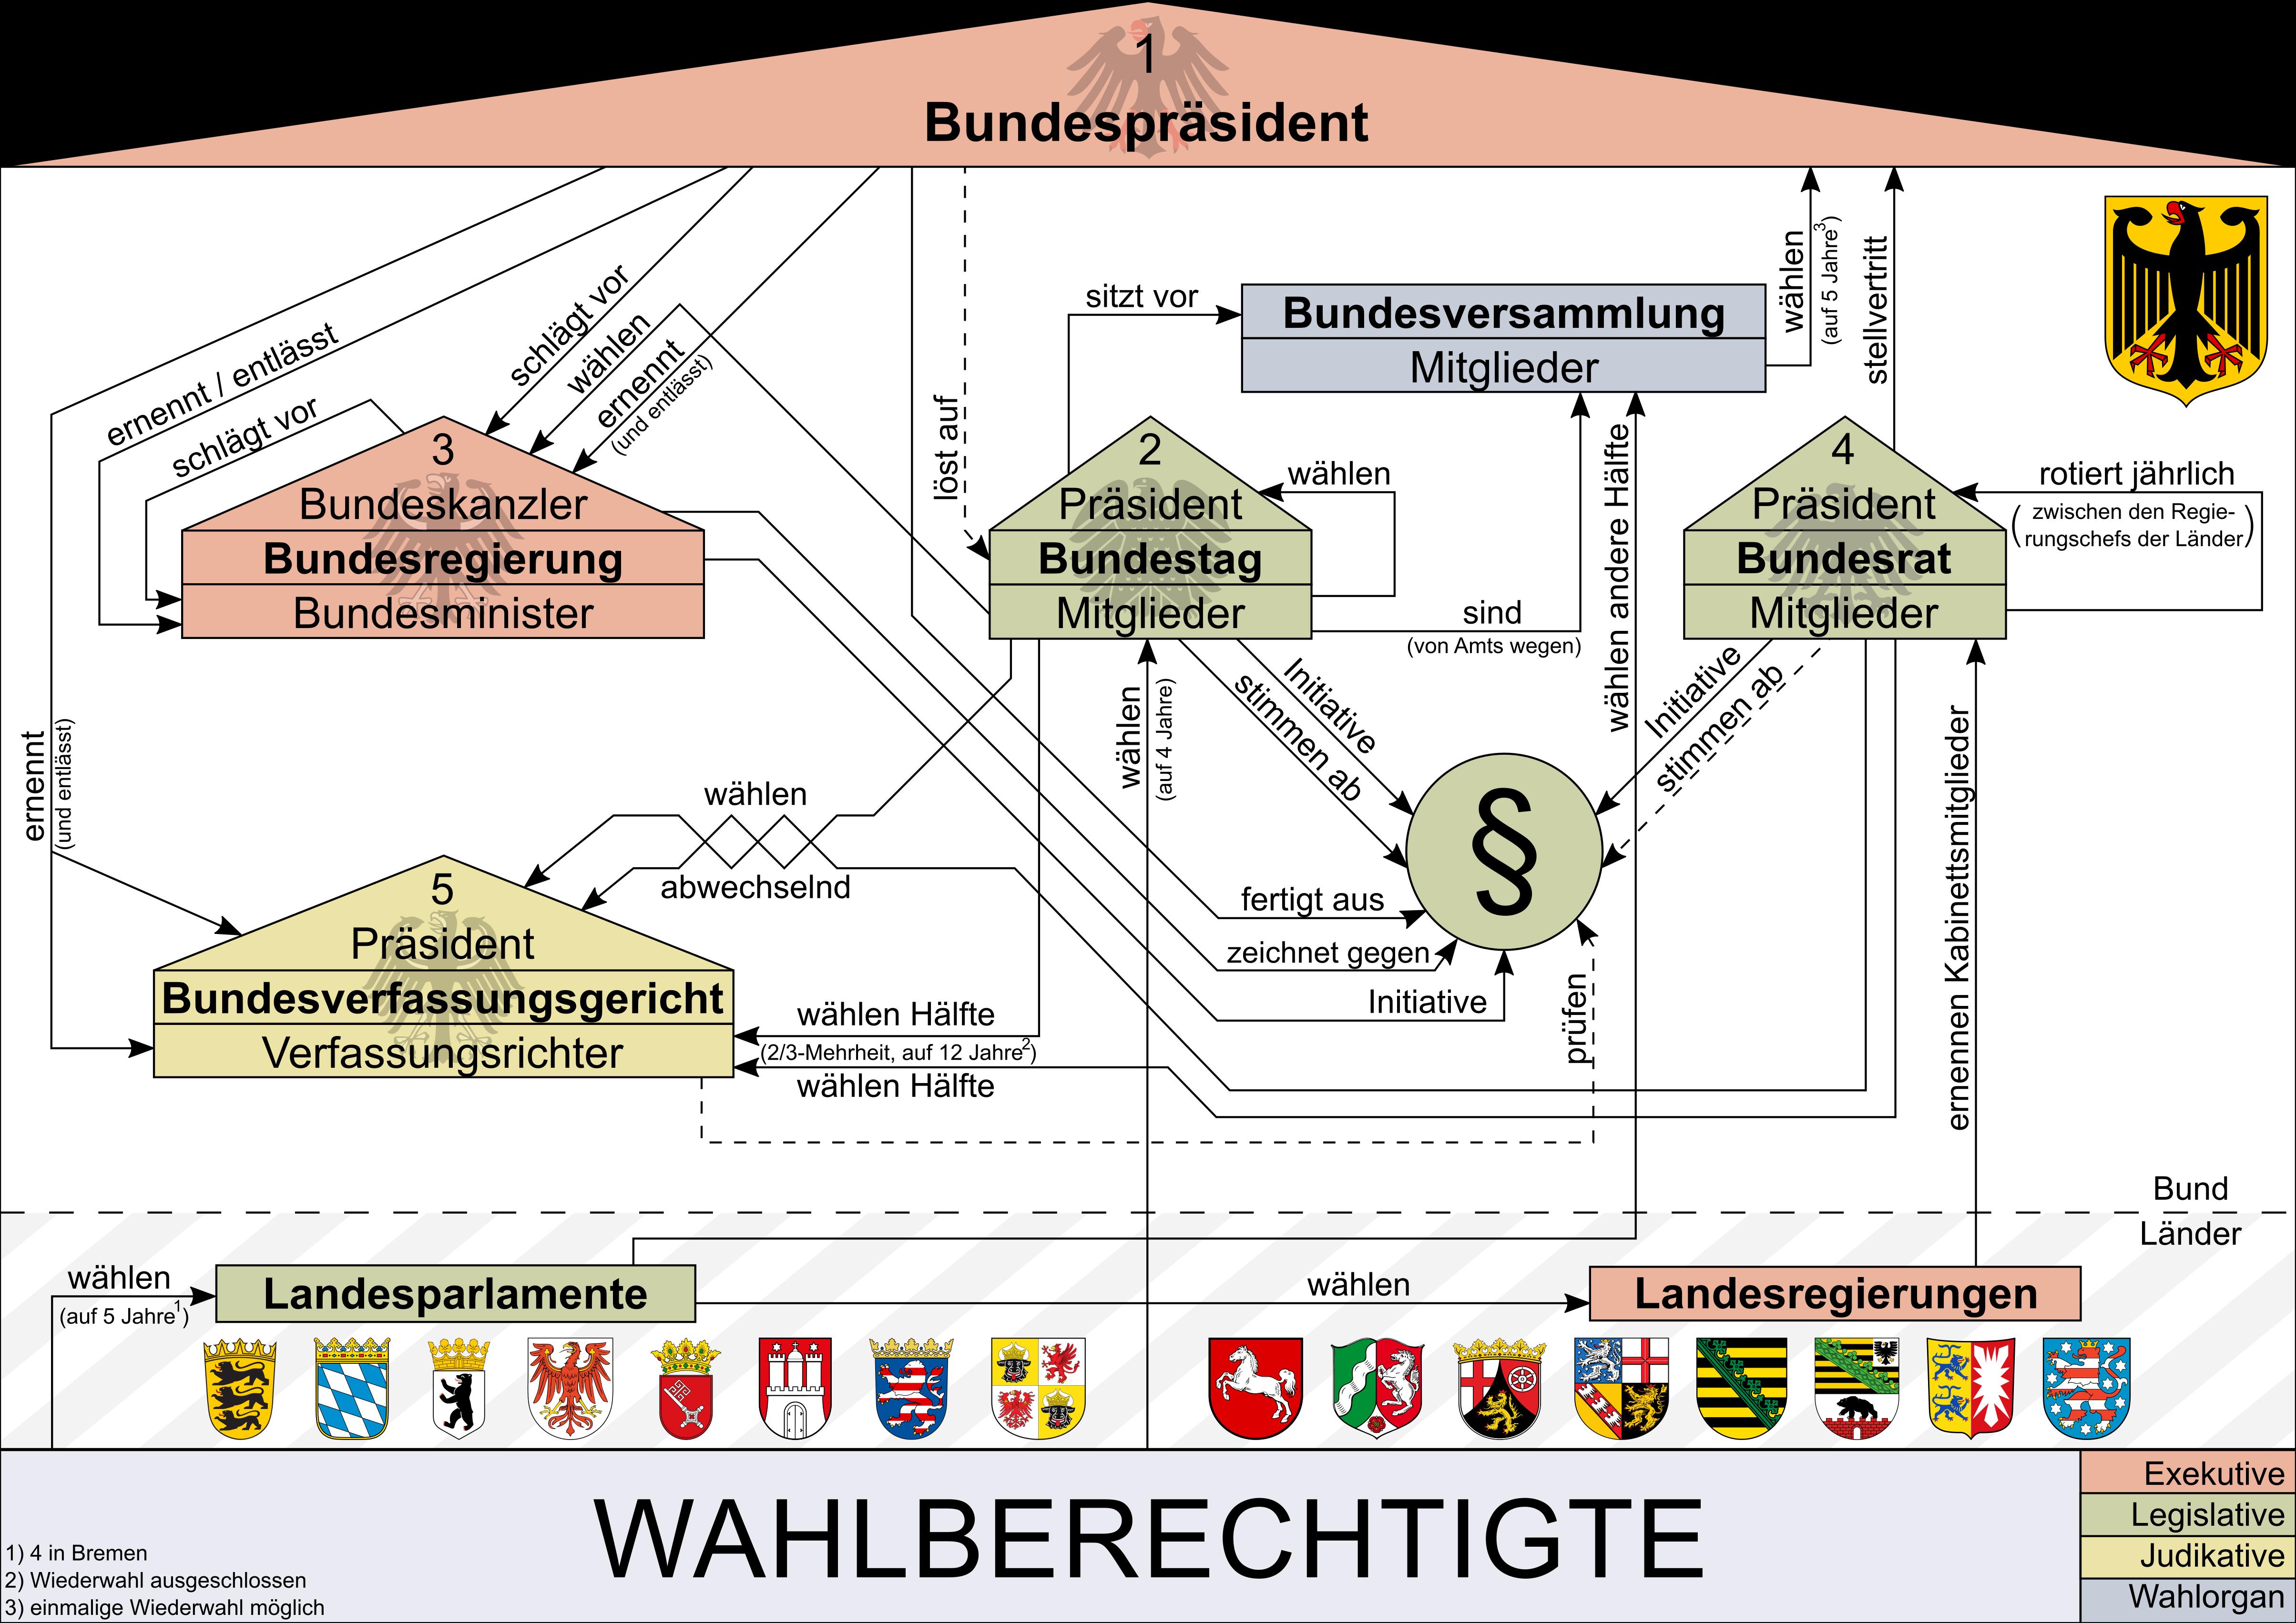 Deutschland Exekutive